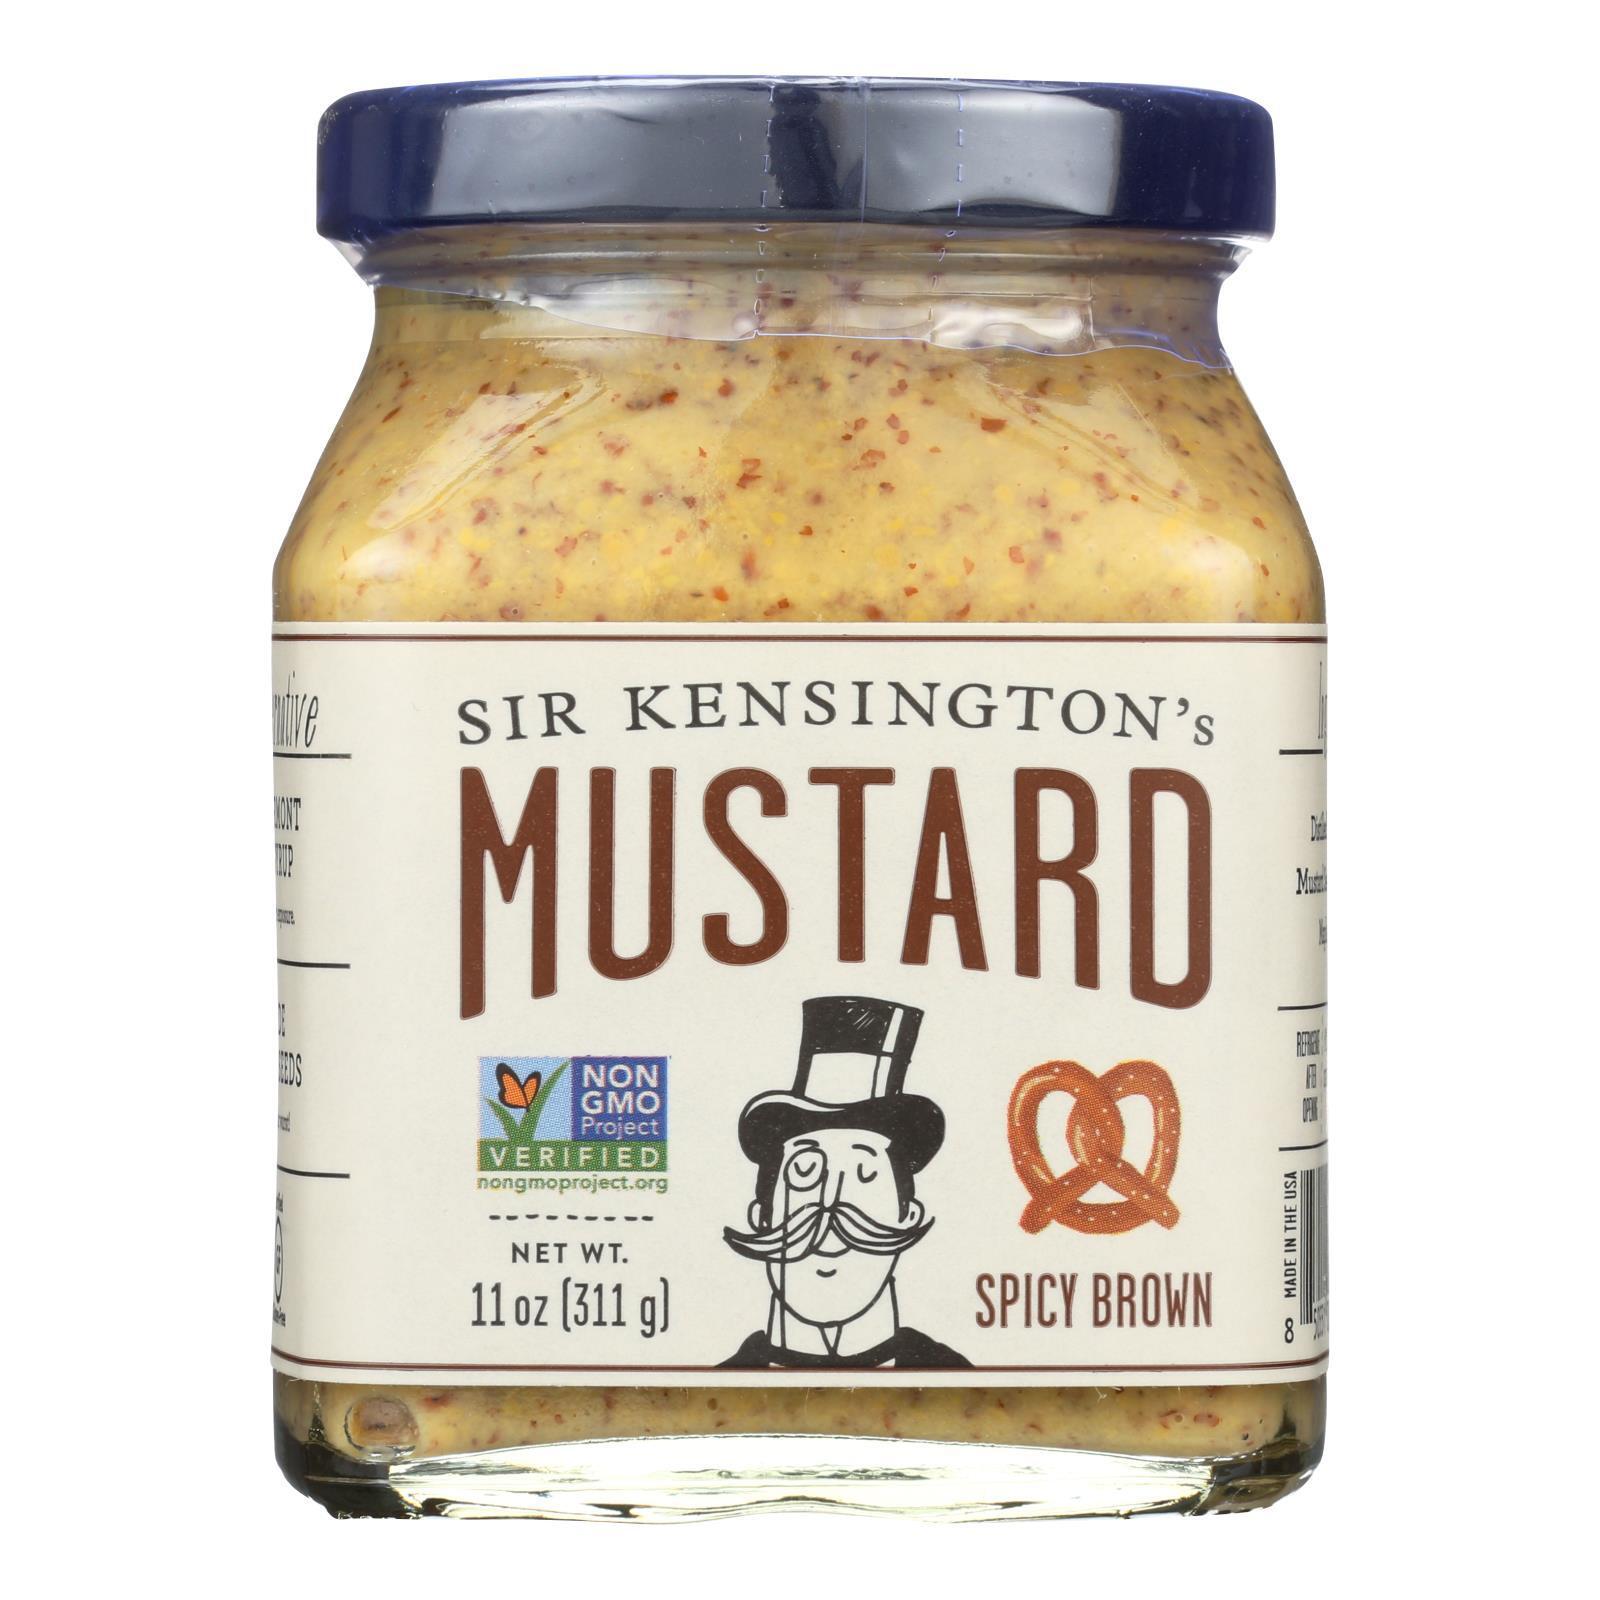 Sir Kensington's Spicy Brown Mustard - Case of 6 - 11 oz.